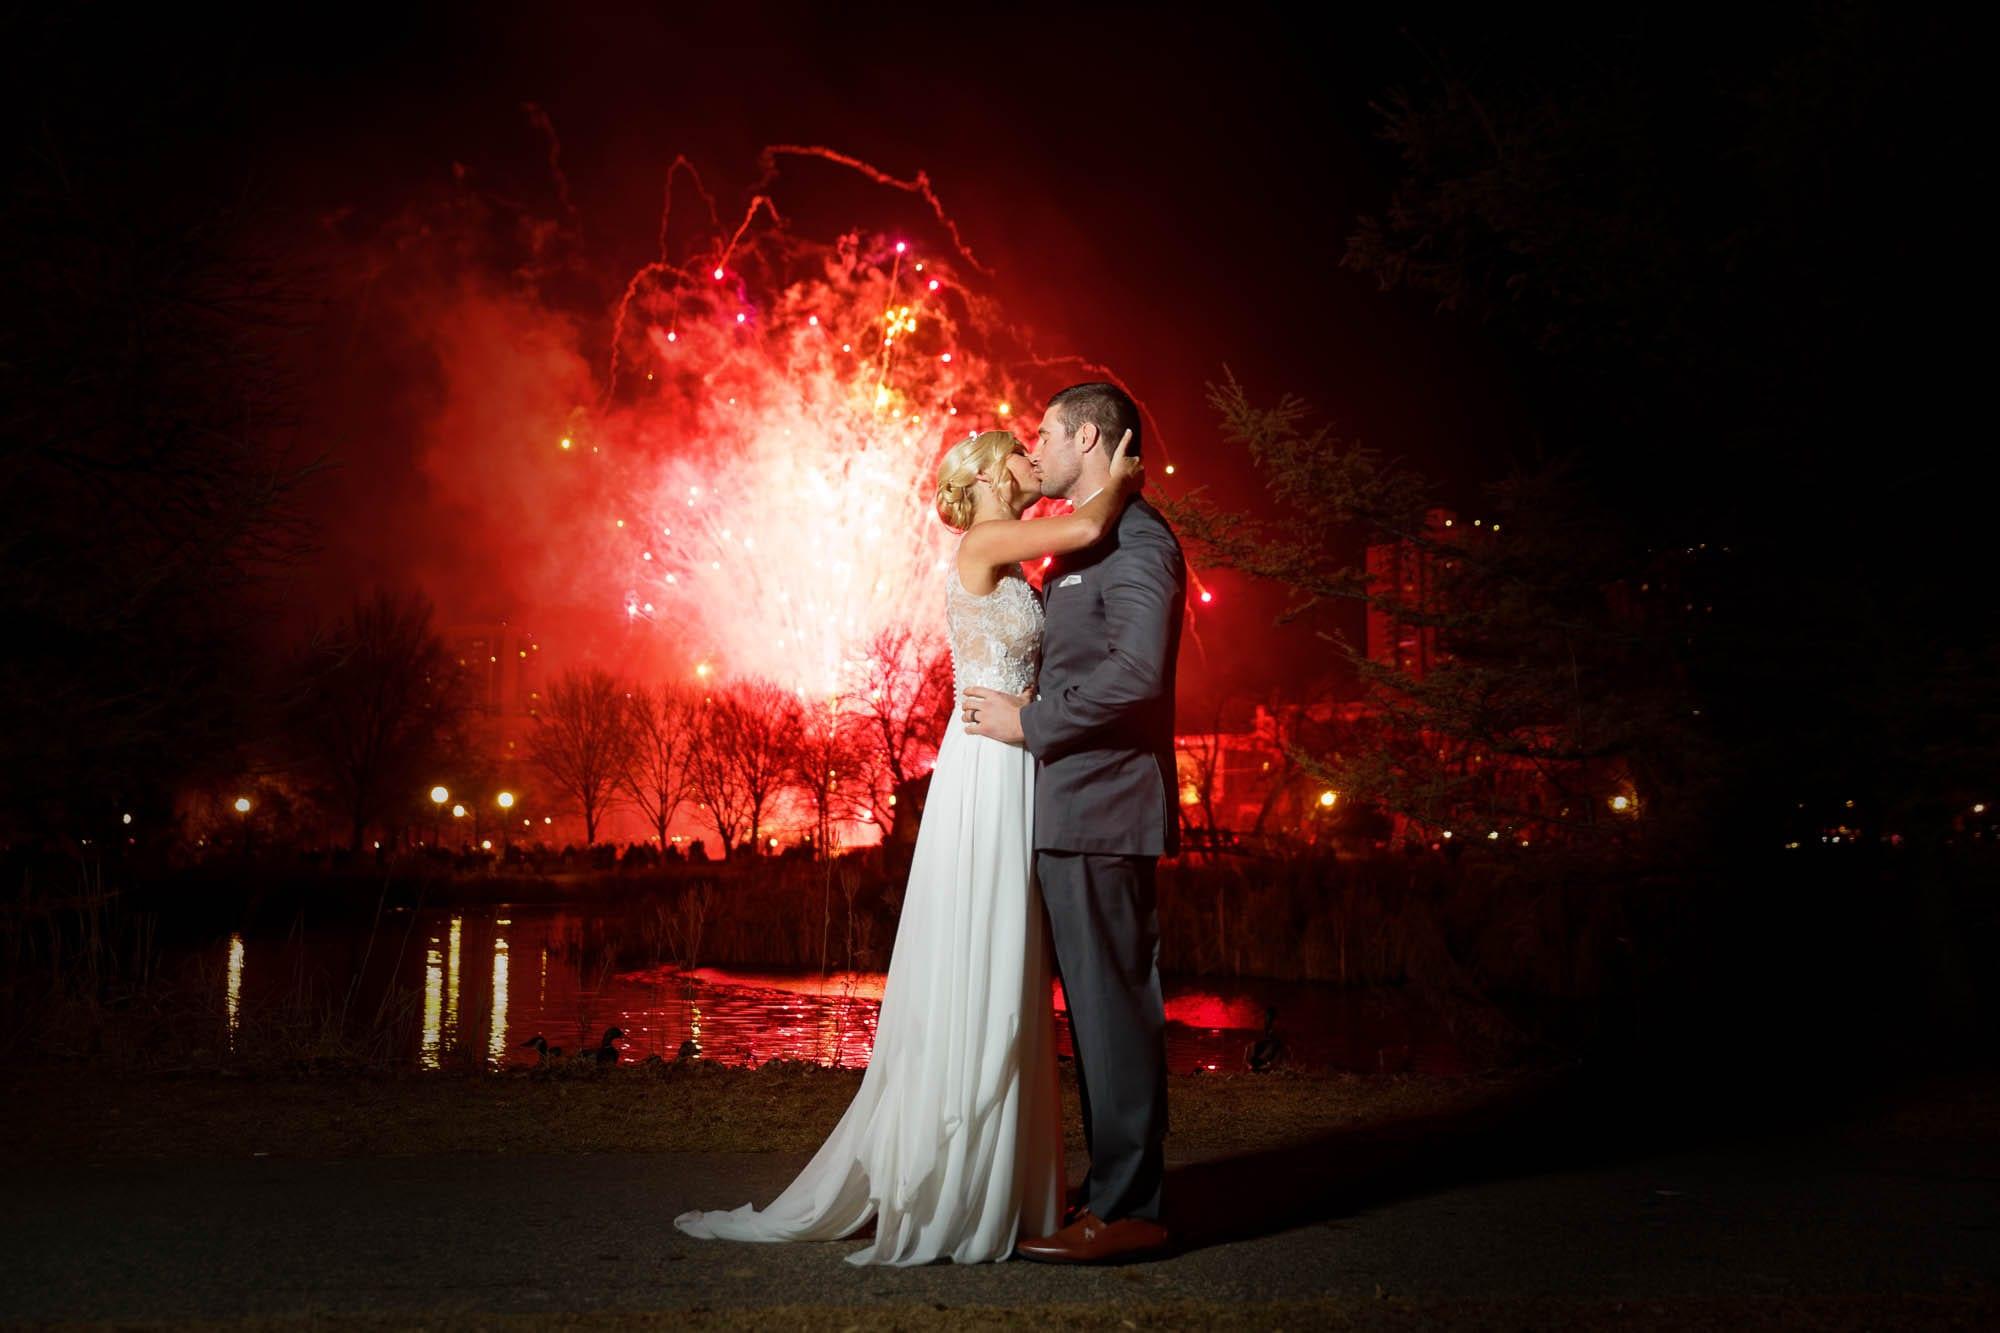 wedding photographer minneapolis 2018